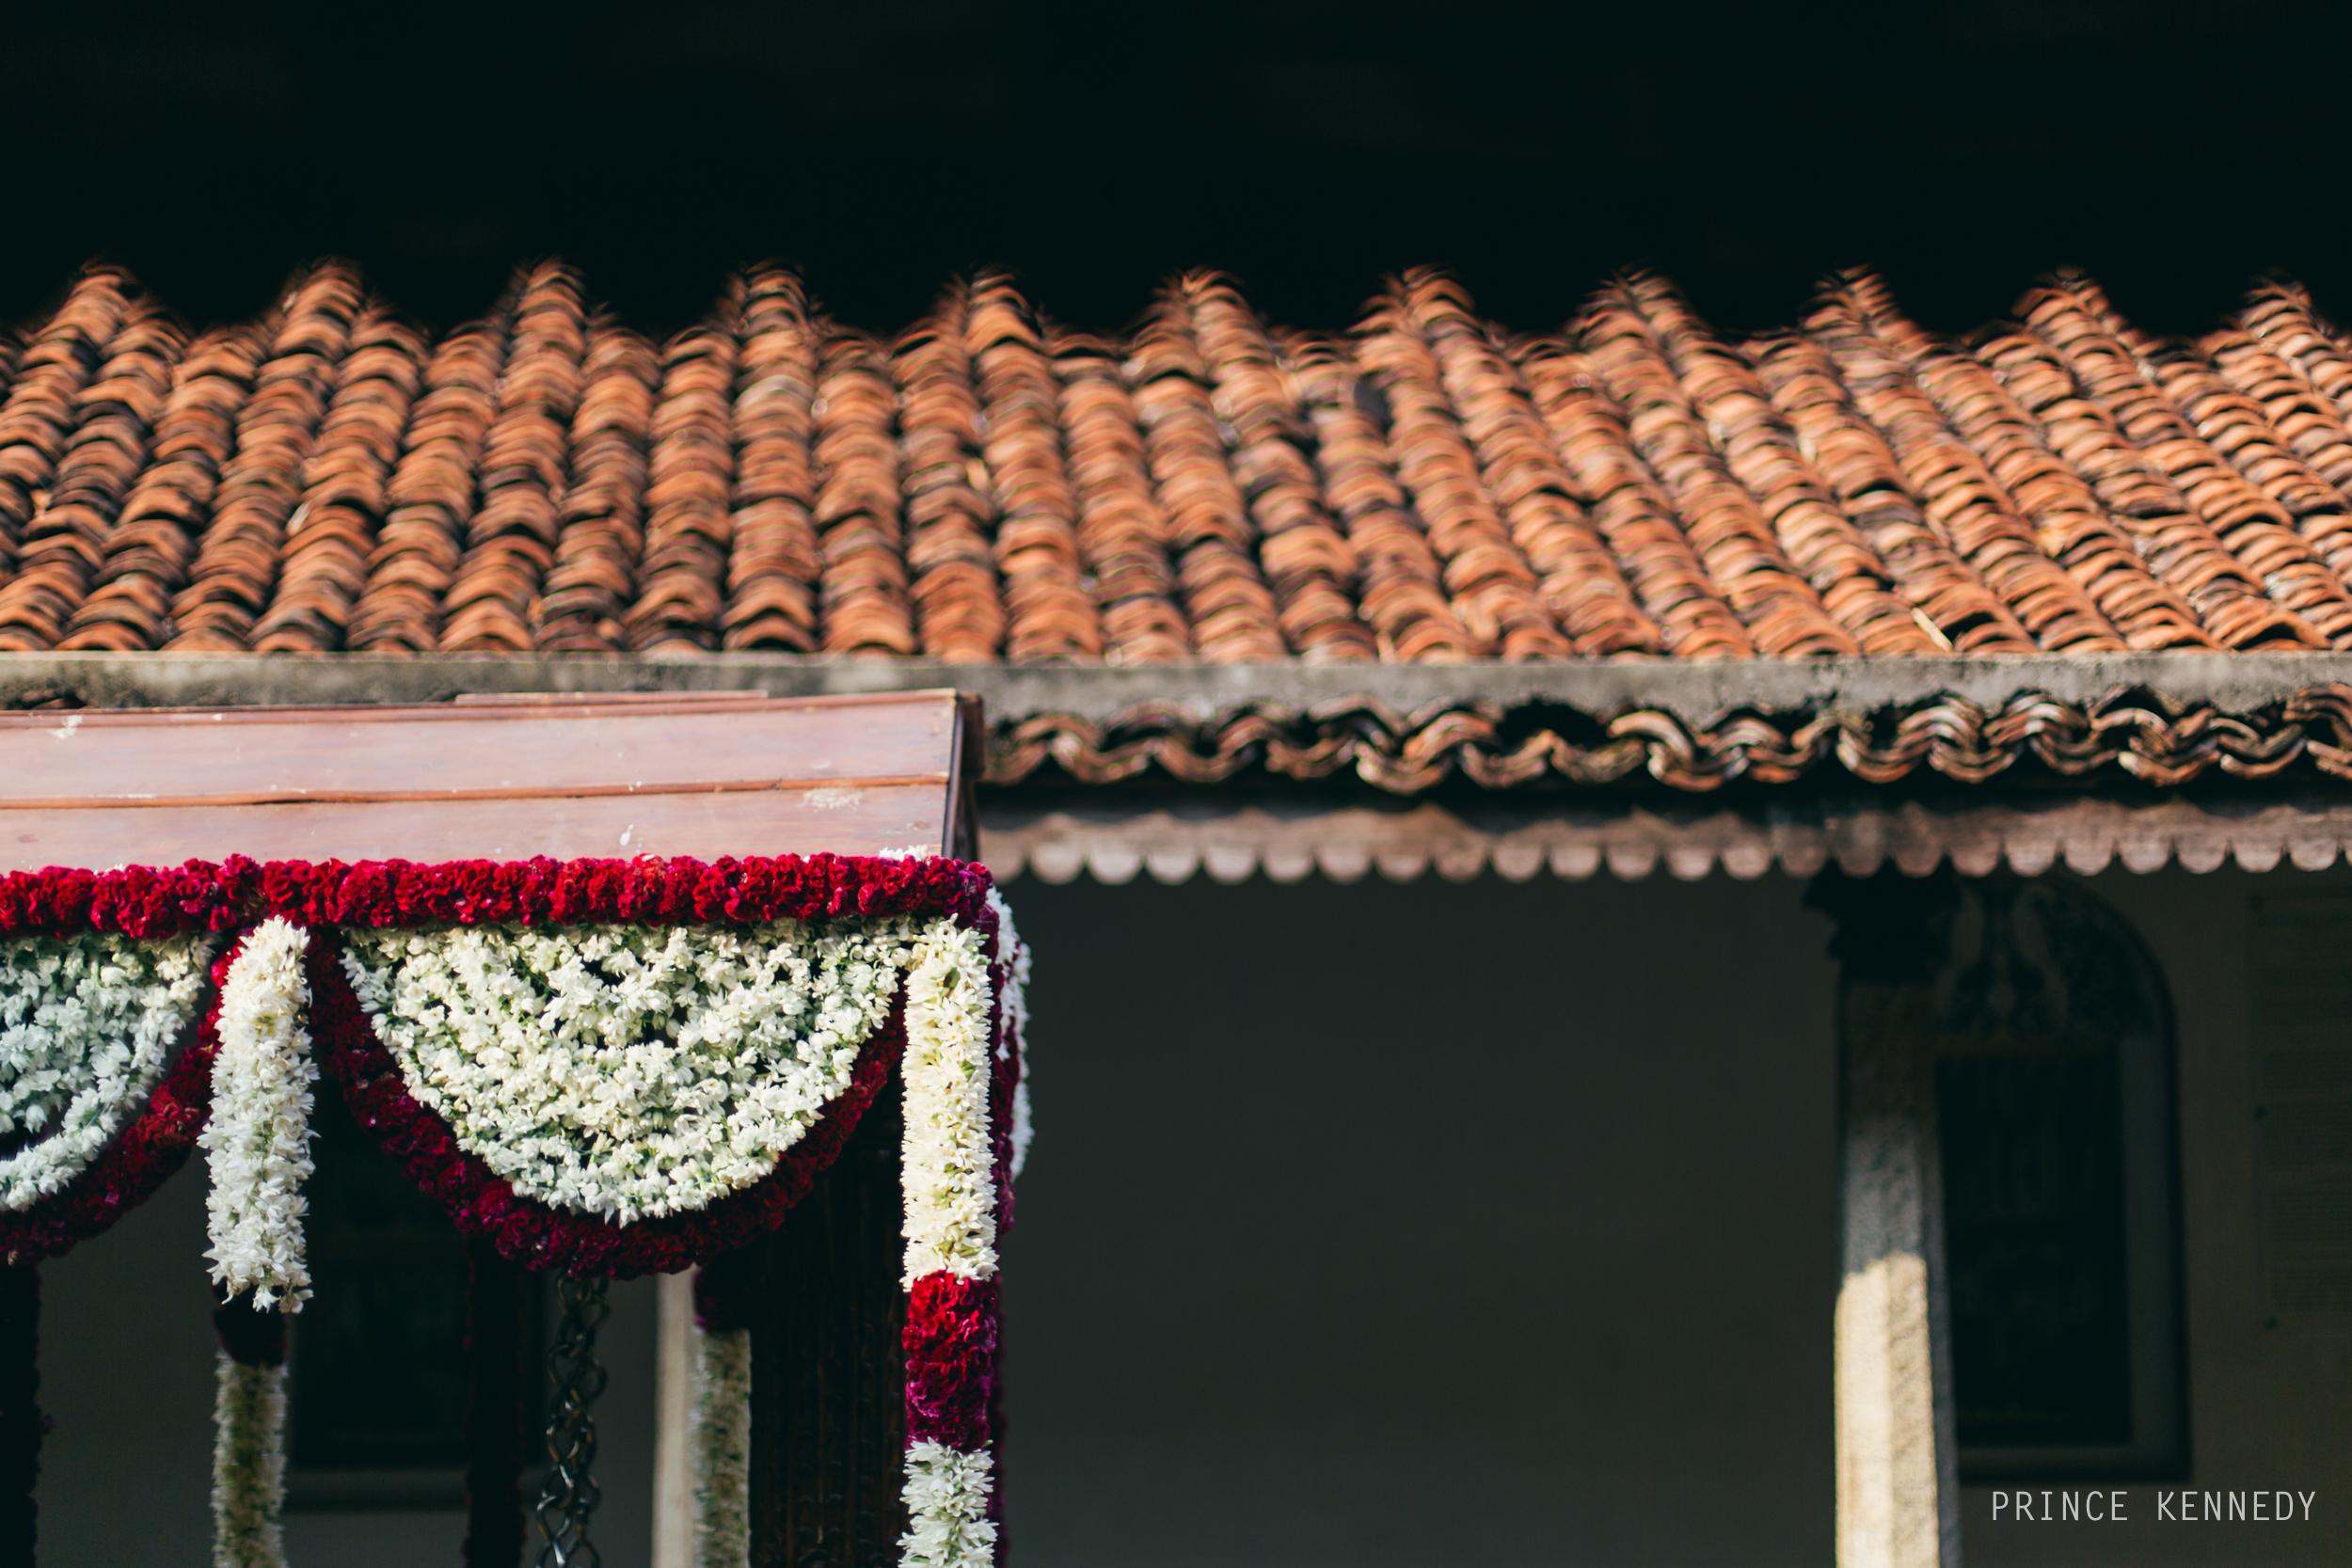 Athmajja-Nithesh-Engagement-Couple-Portrait-Portraiture-Wedding-Couple-Portrait-Chennai-Photographer-Candid-Photography-Destination-Best-Prince-Kennedy-Photography-21.jpg